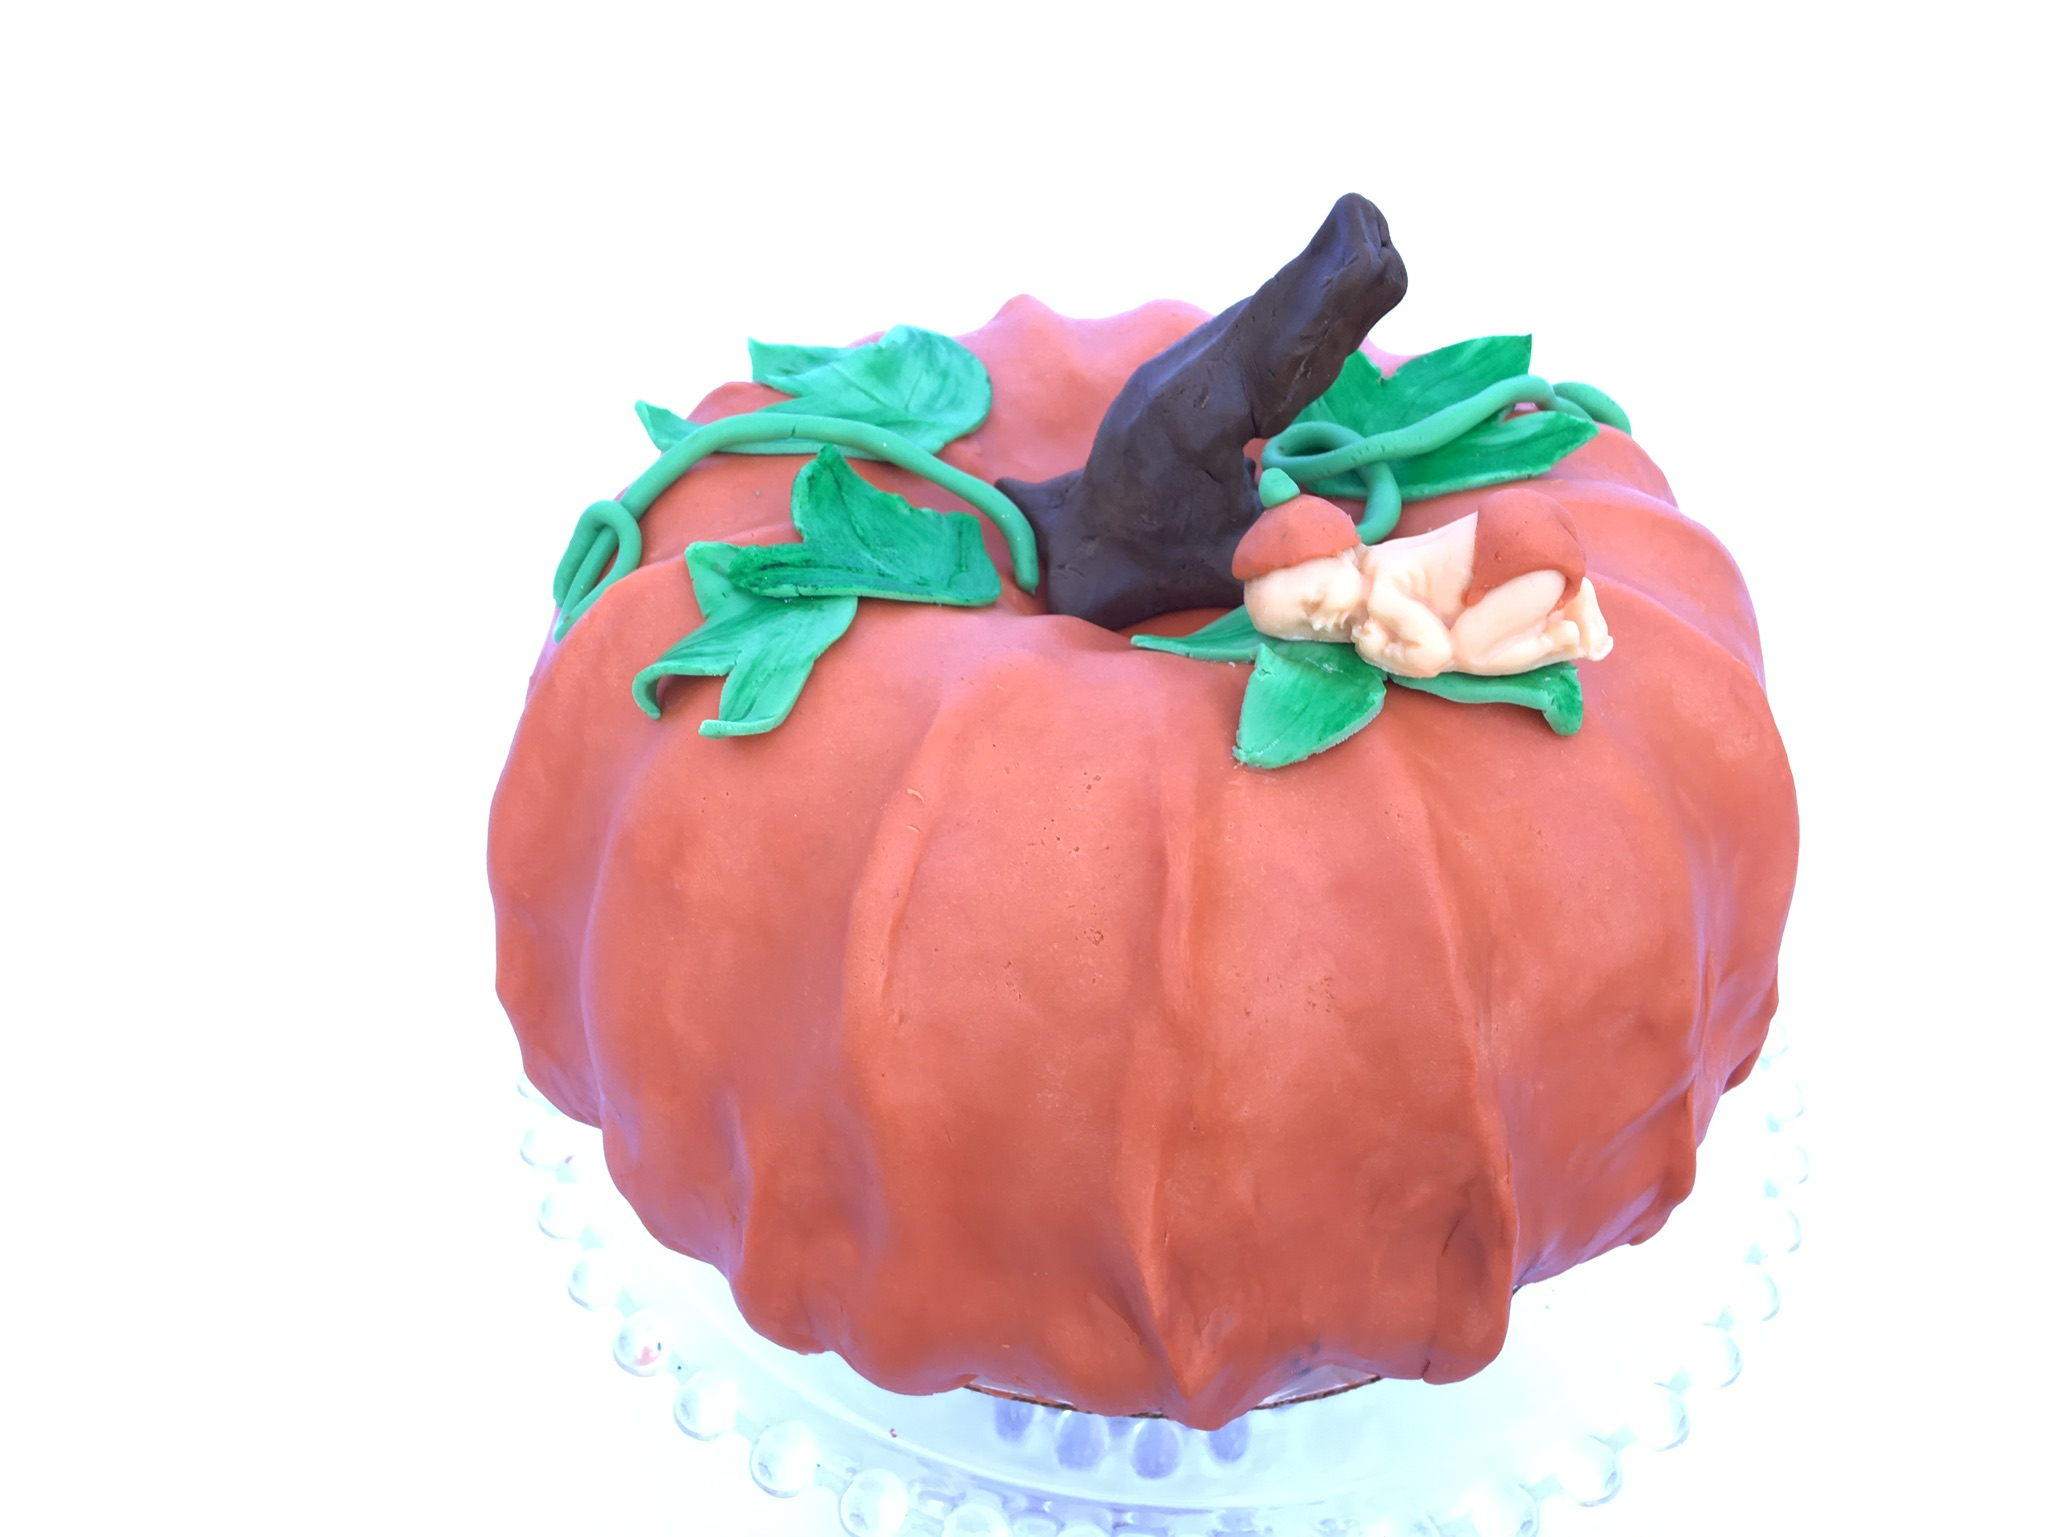 Beneath the Crust: How to Make a pumpkin-shaped Cake